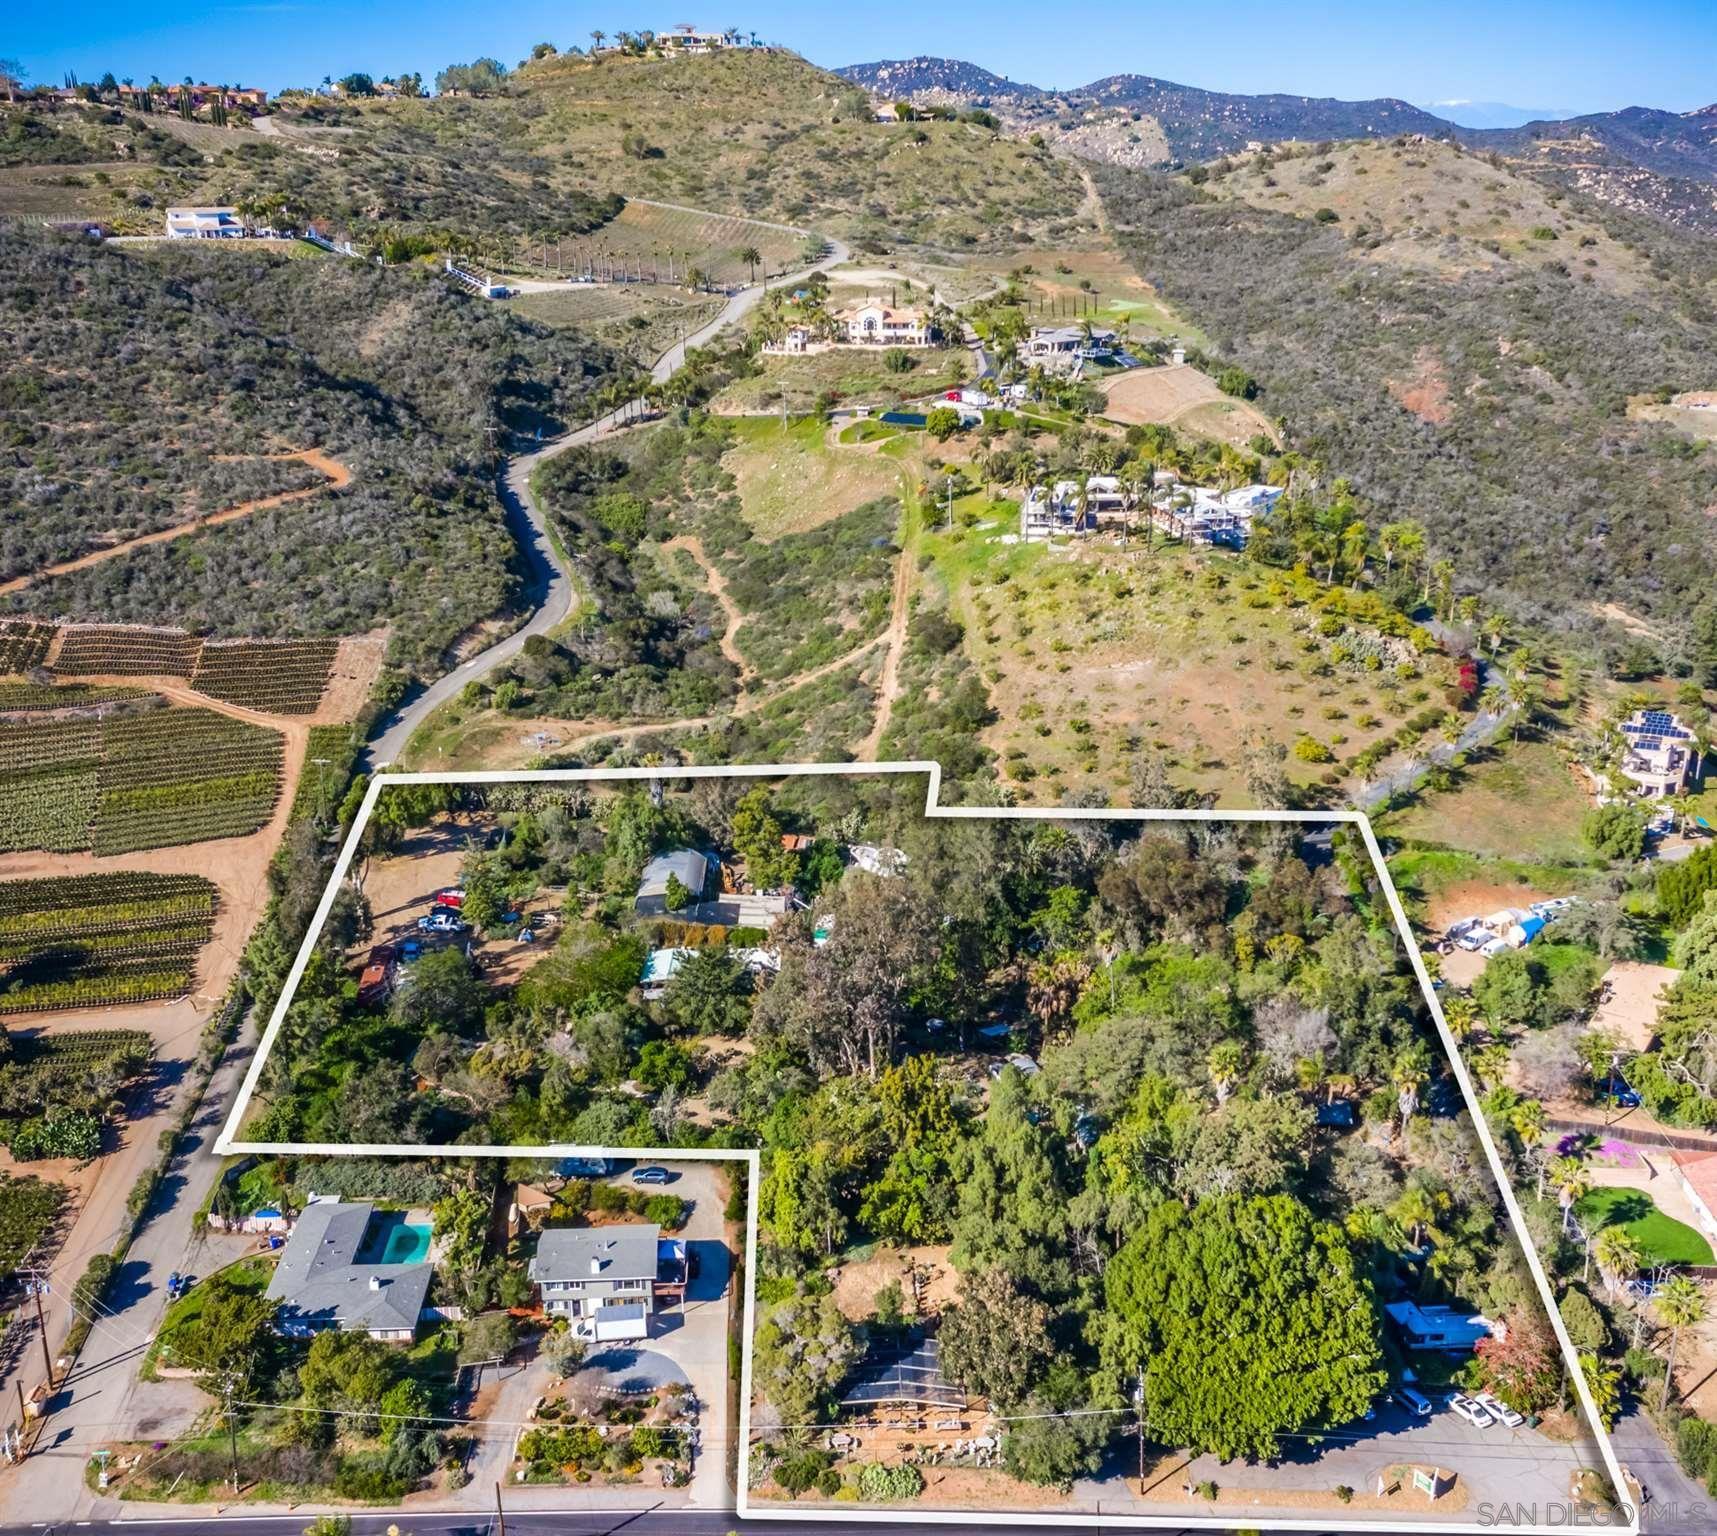 Photo of 418 Buena Creek Road, San Marcos, CA 92069 (MLS # 210000759)